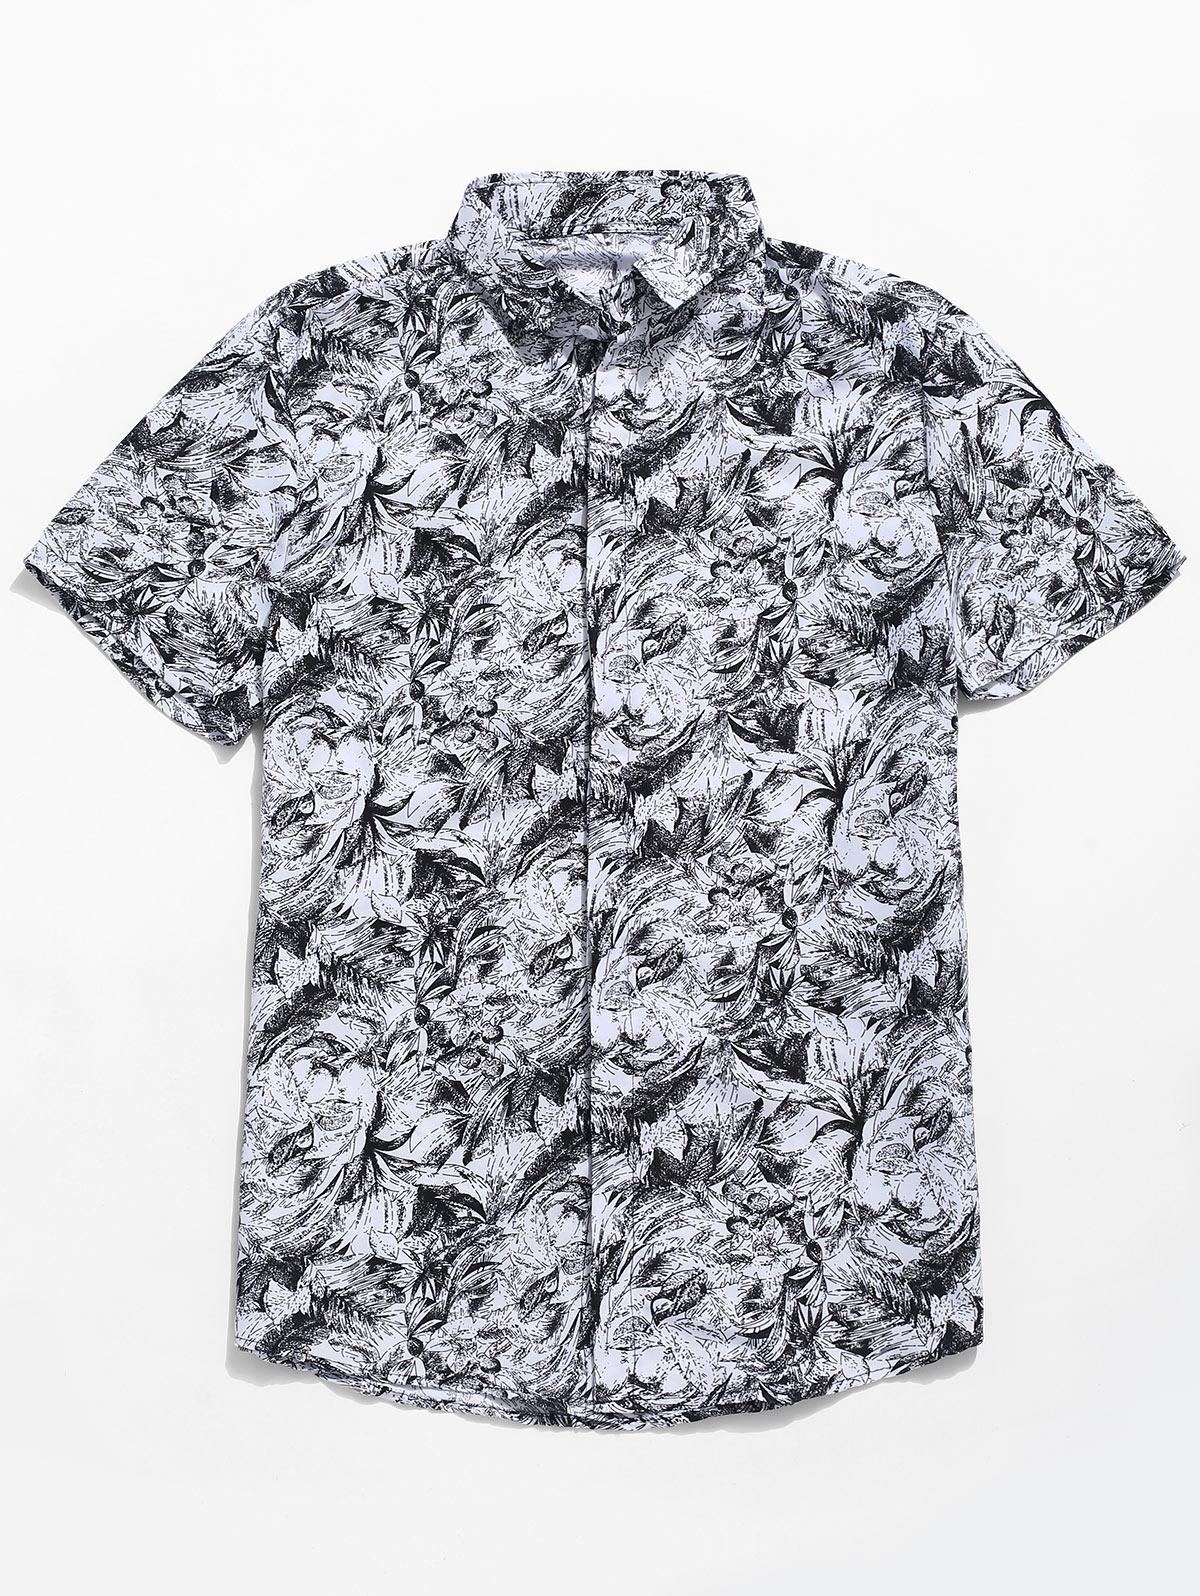 Palm Leaf Print Button Up Shirt, White